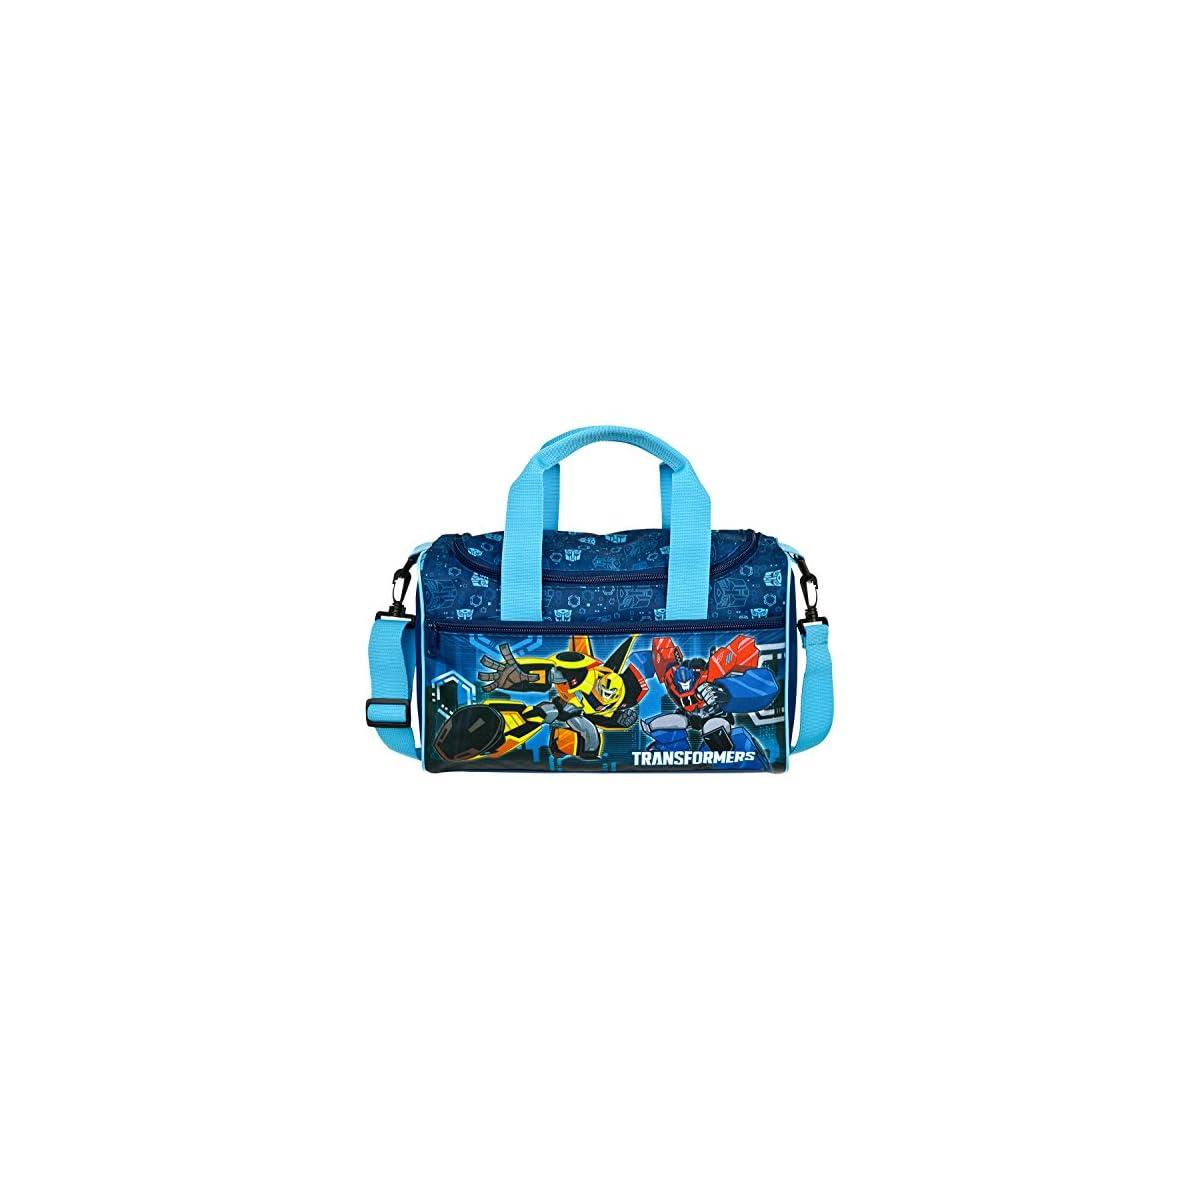 51OnUDD2boL. SS1200  - Unbekannt Bolsa con cordón, Azul (Azul) - 10016654